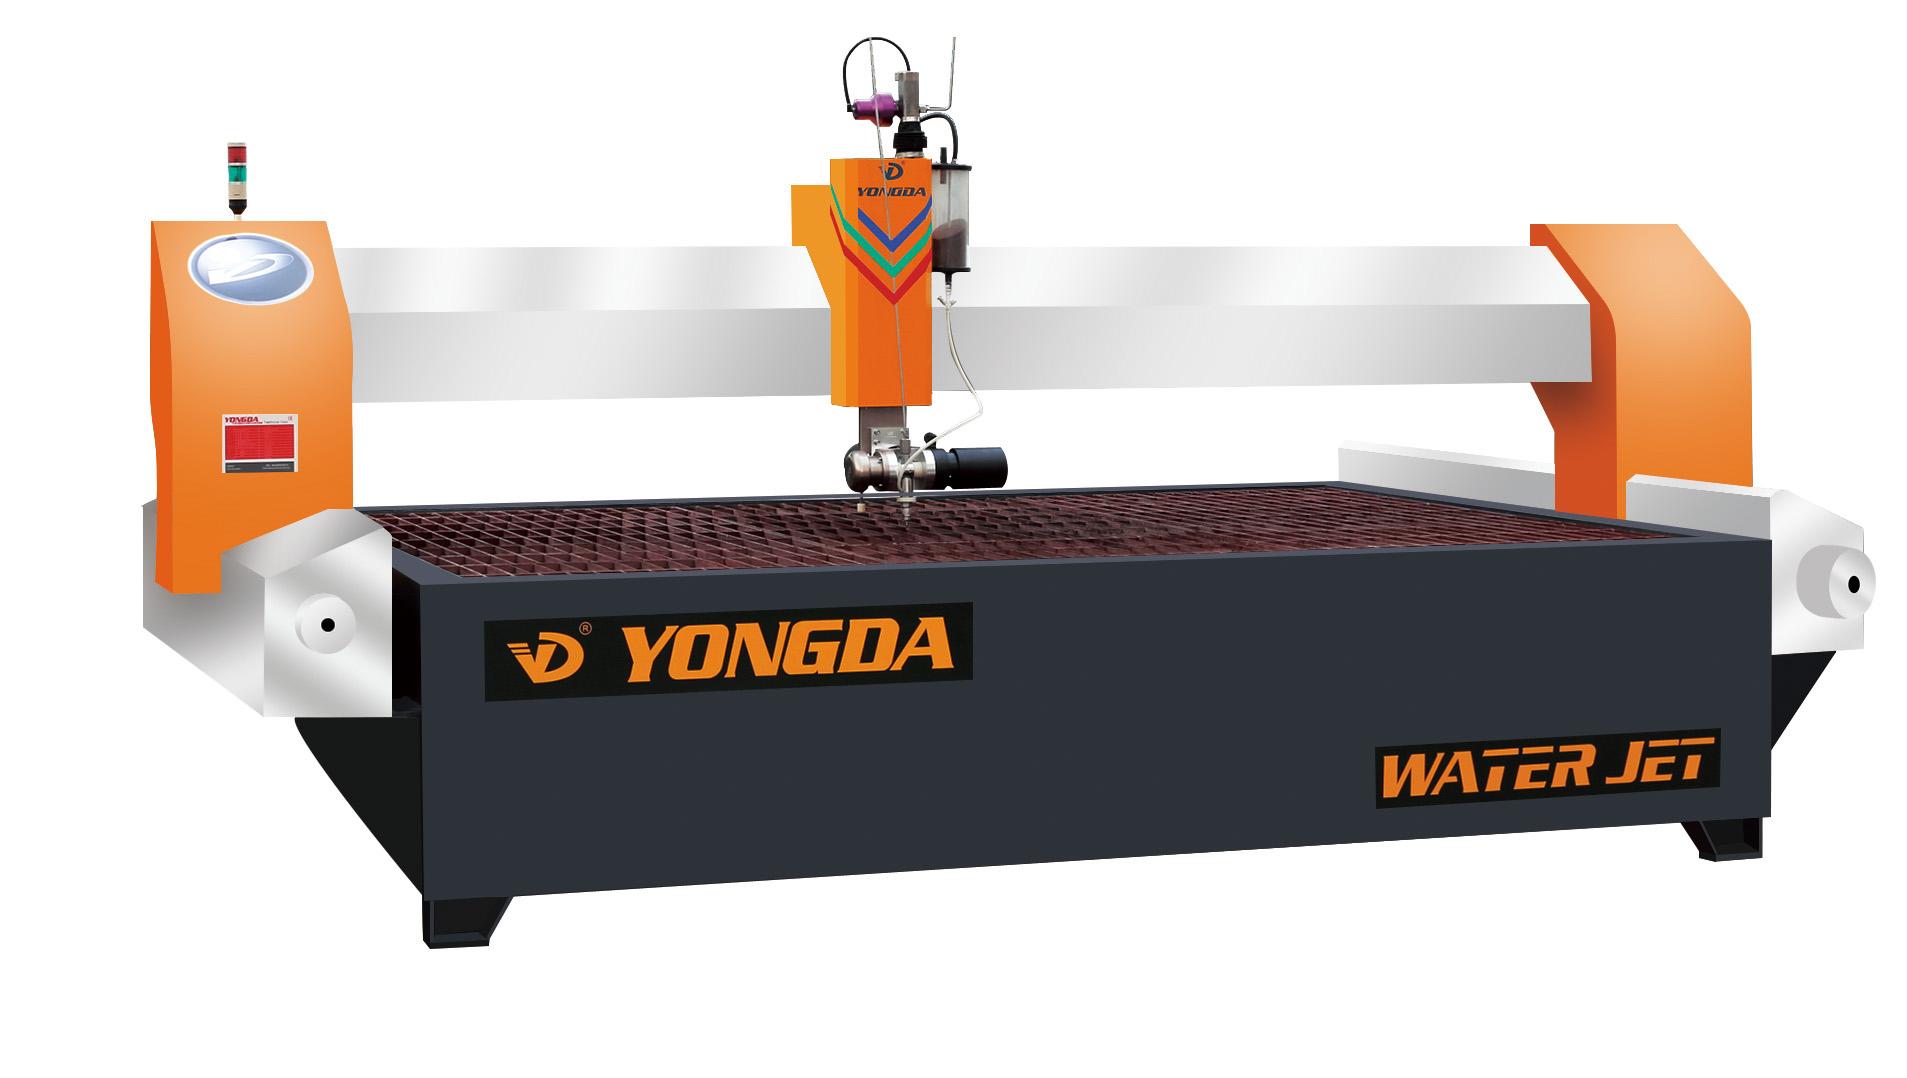 YONGDA-Yongda water jet faster cutting speed, higher return on investment-2